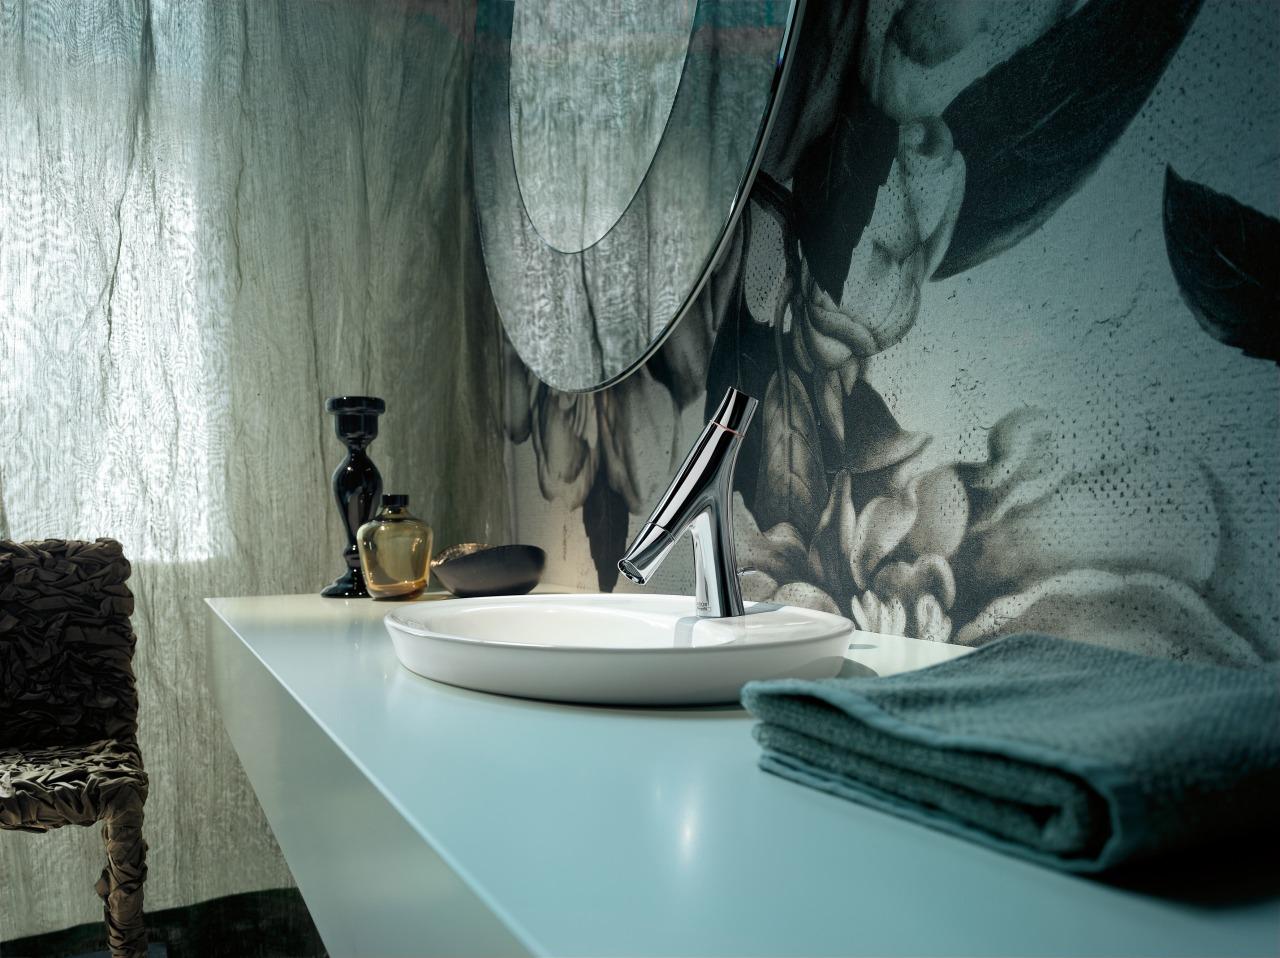 This sculptural bathroom tap complements a round sink, bathroom, interior design, room, window, gray, black